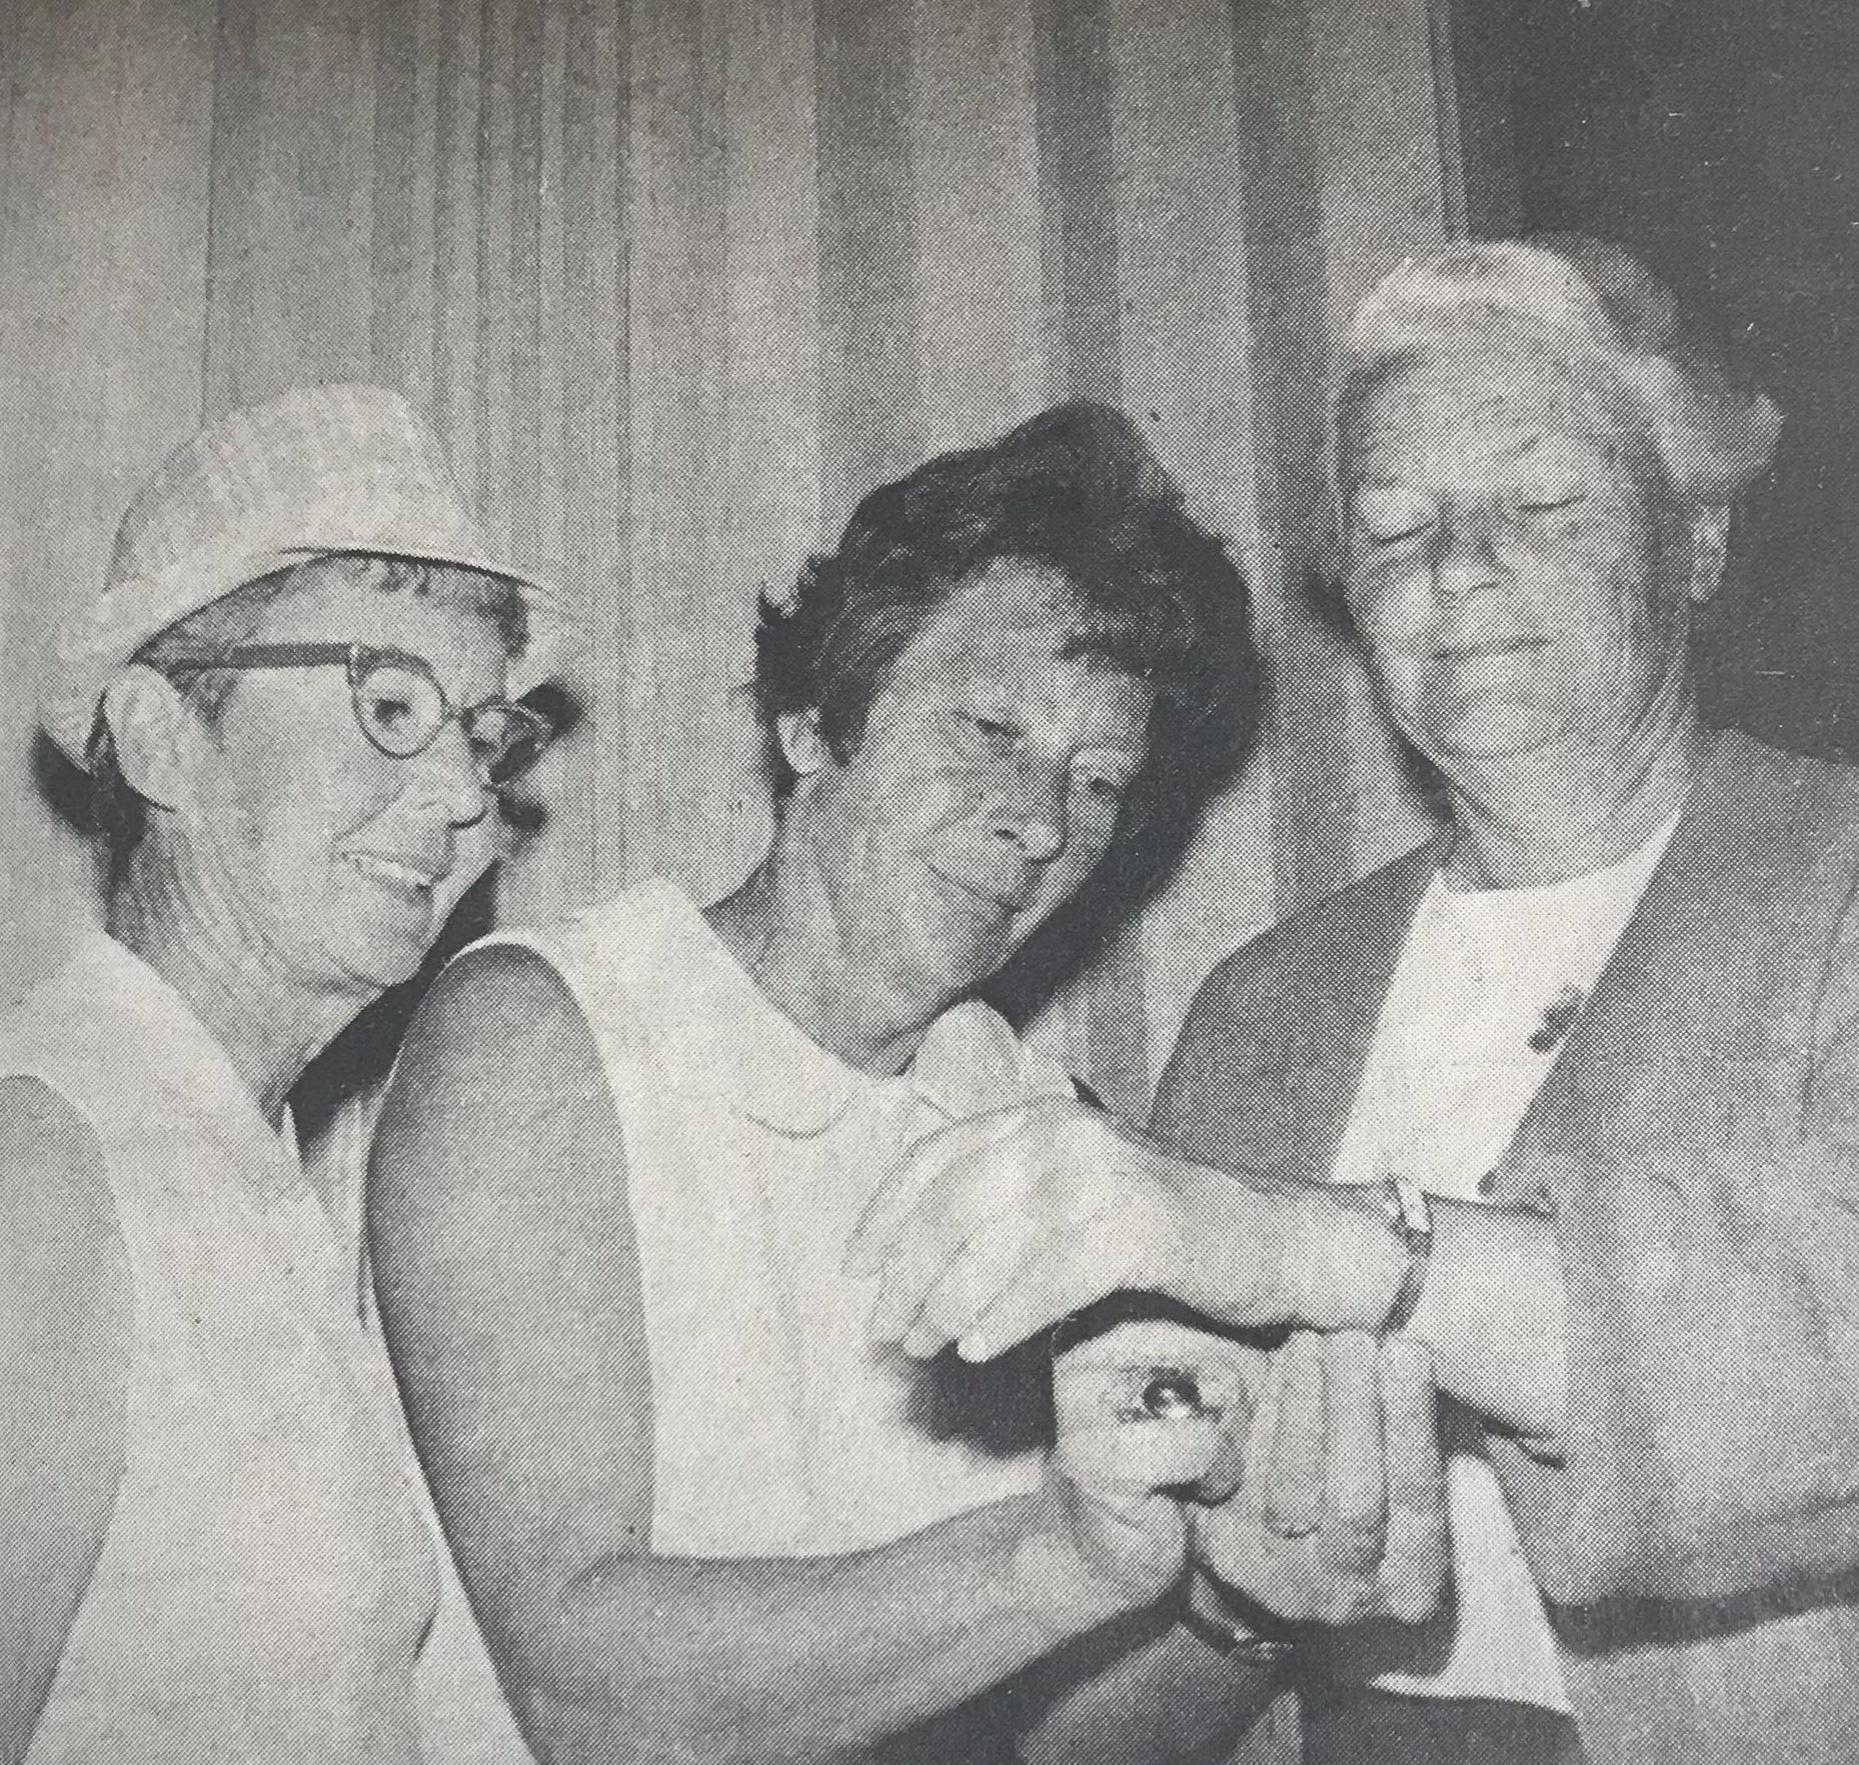 MESDAMES LAPHAM (L), WESTON ADMIRE MILDRED JUDE'S GOLD WATCH  Miss Jude won Pacific Women's Golf Association Championship